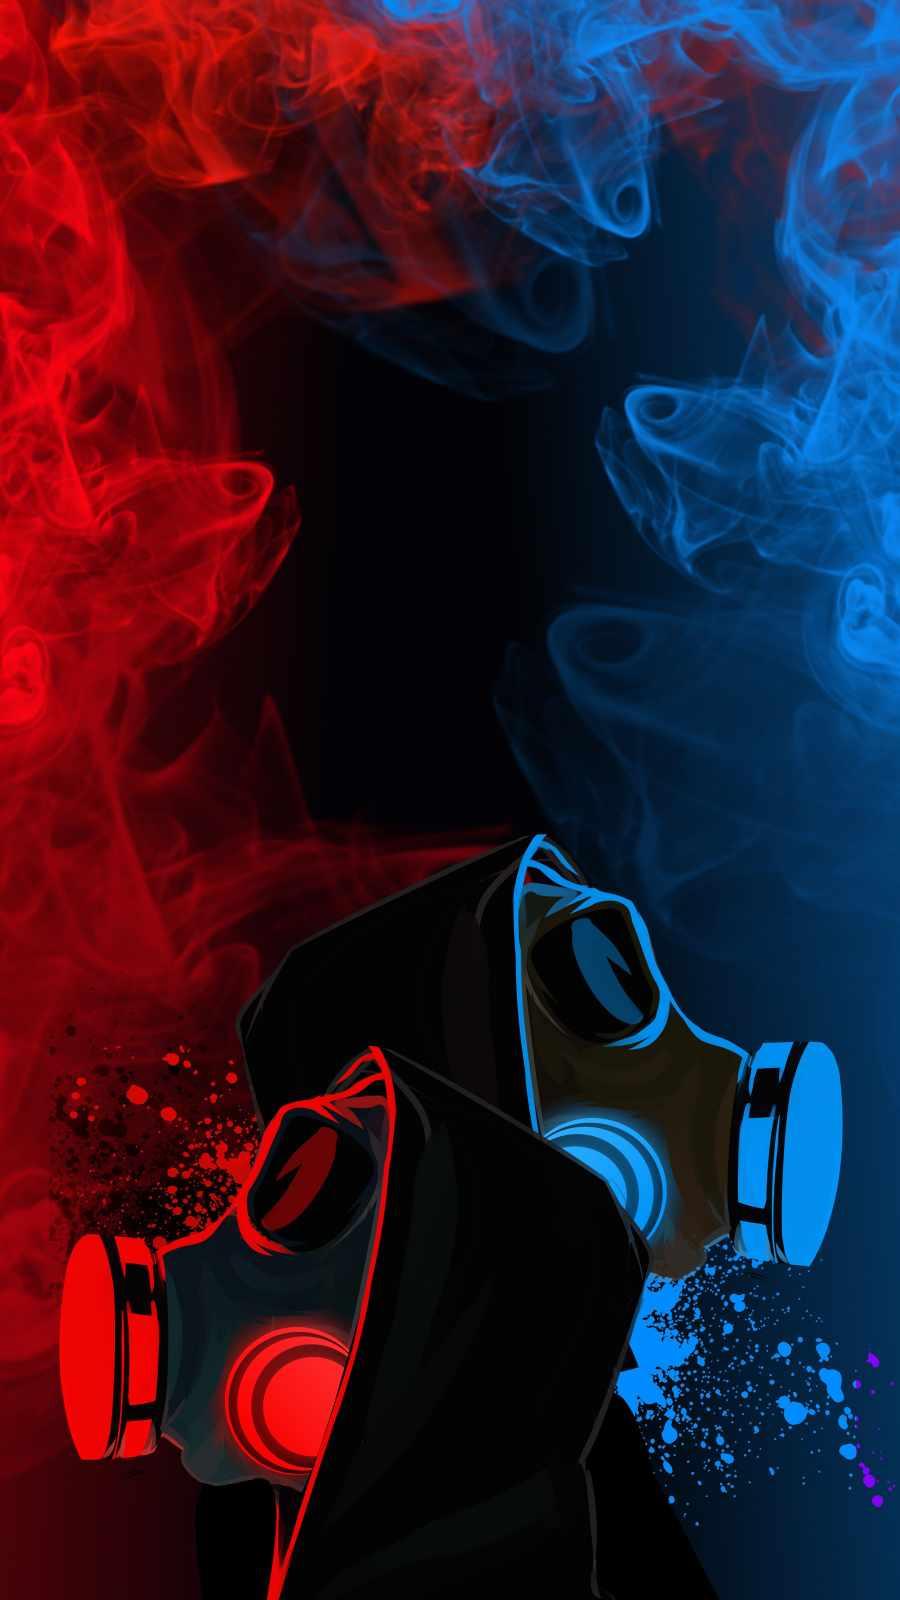 Smoke Neon Mask